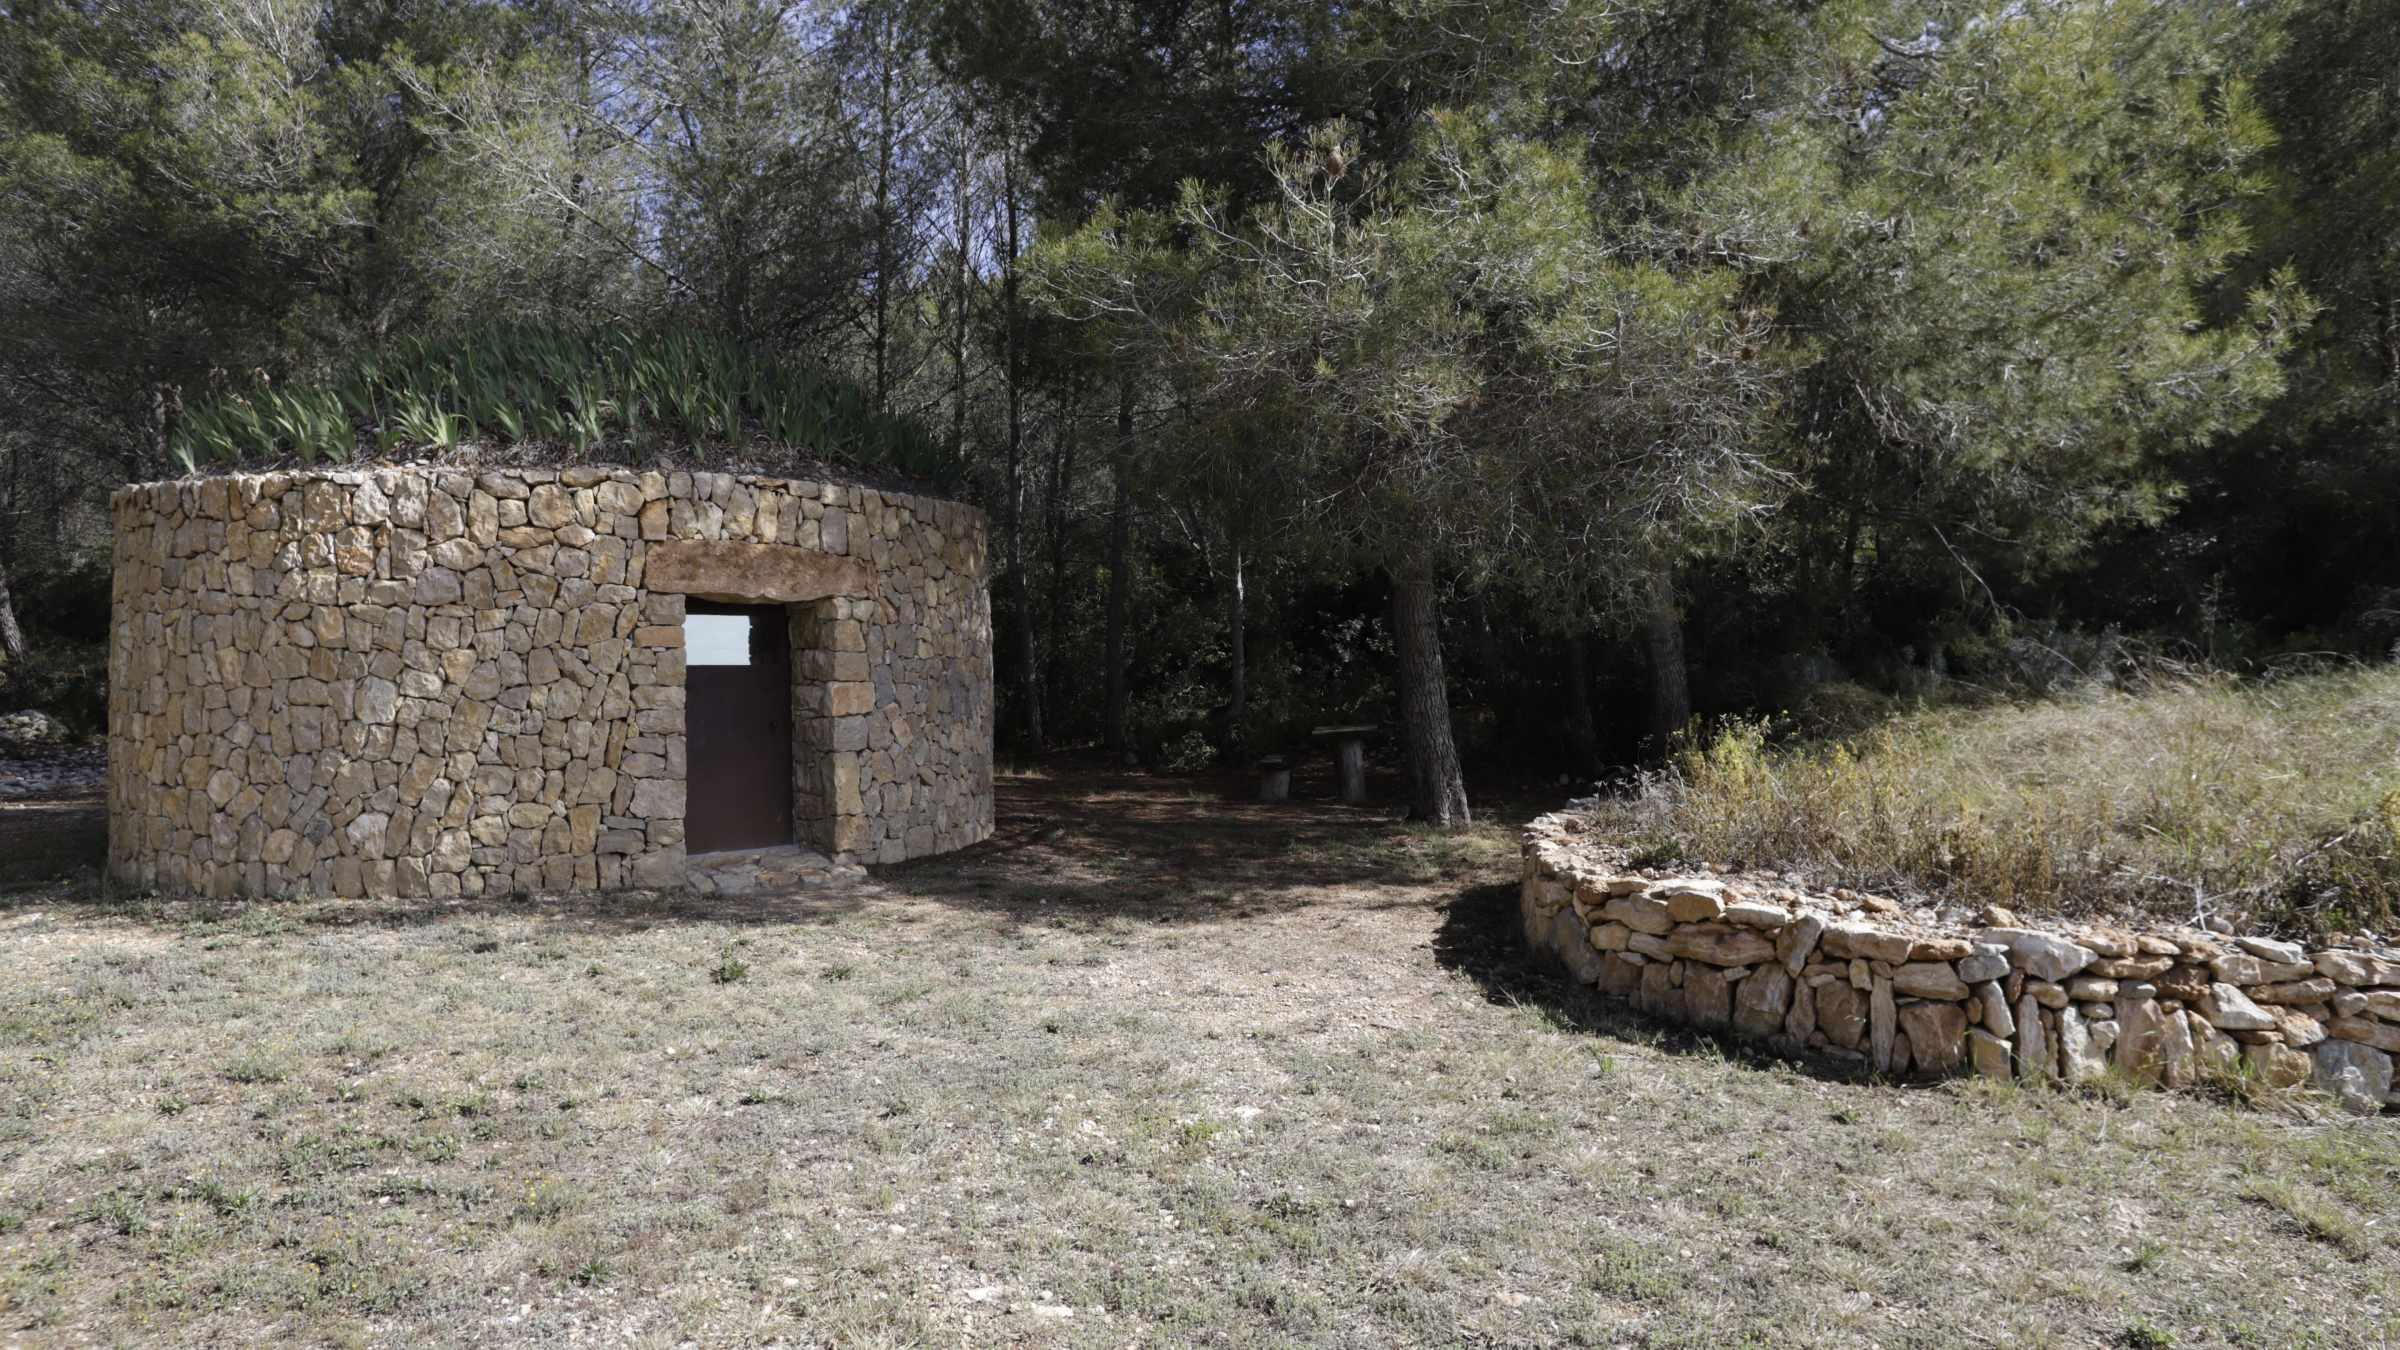 Barraca Rossellet